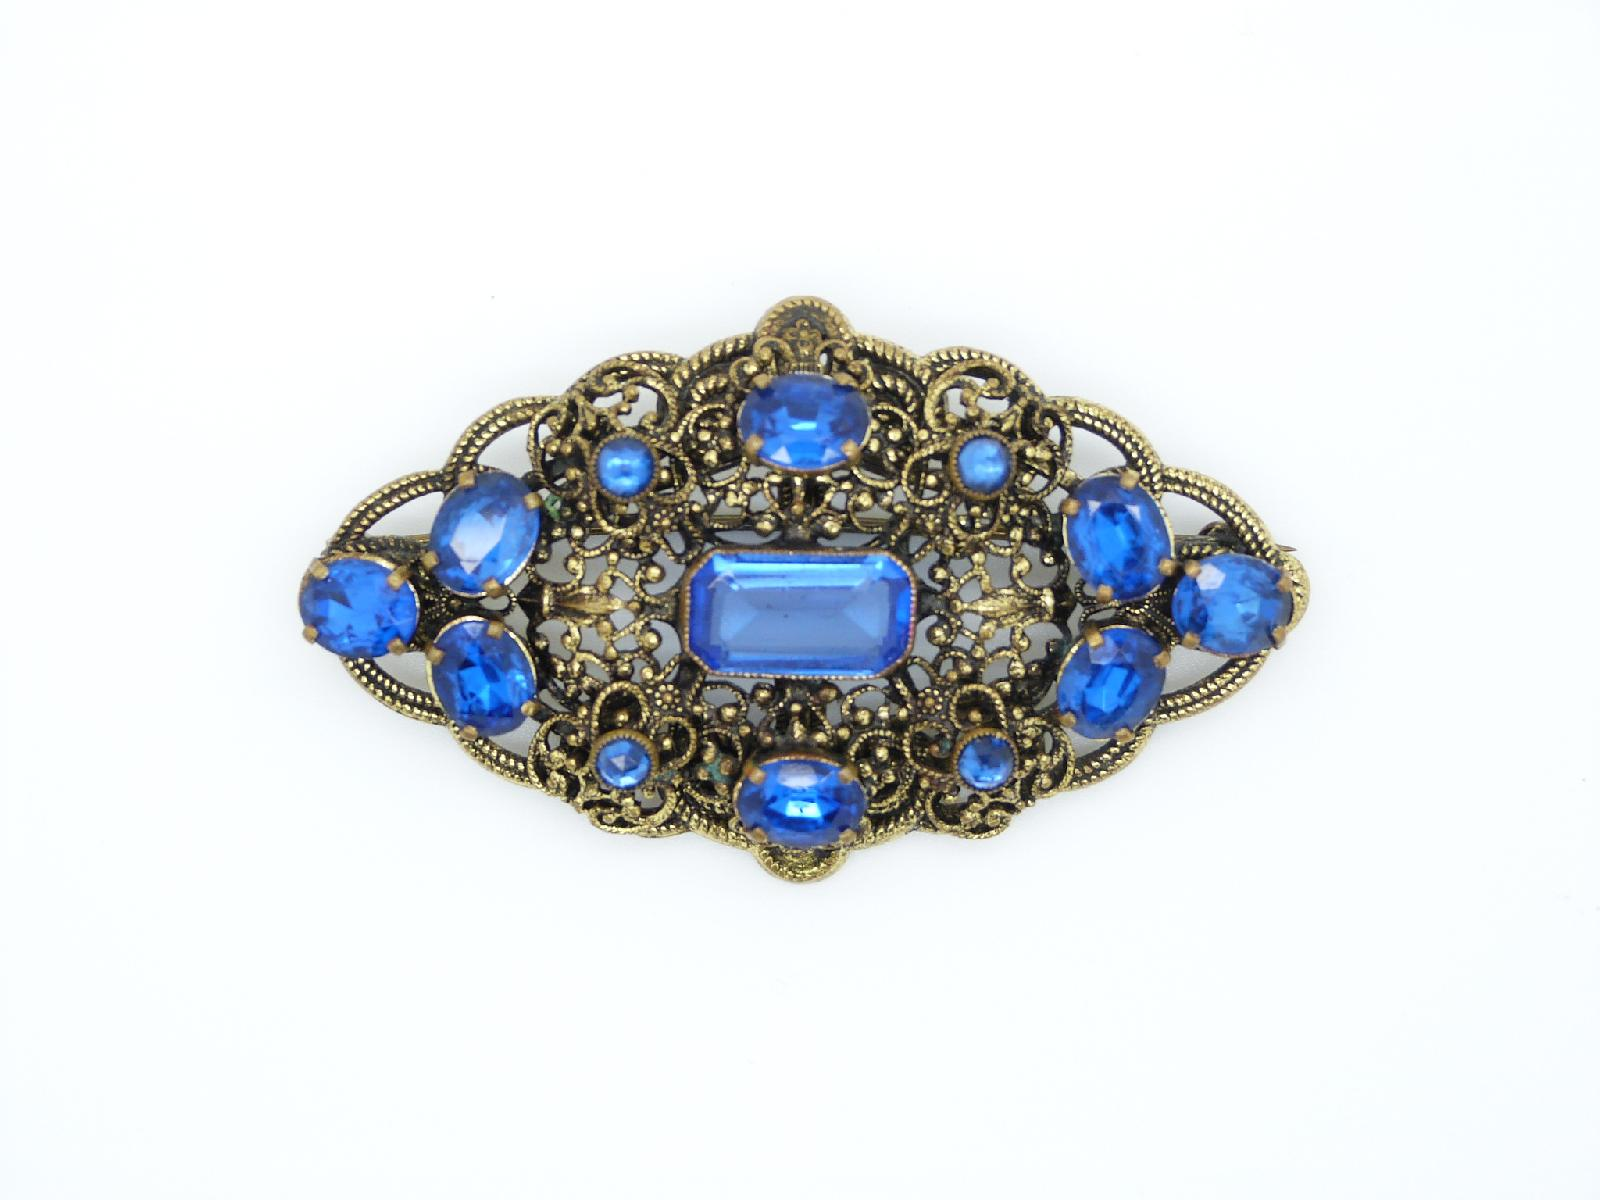 Vintage 30s Large Czech Filigree Lozenge Shape Blue Paste Stone Brooch